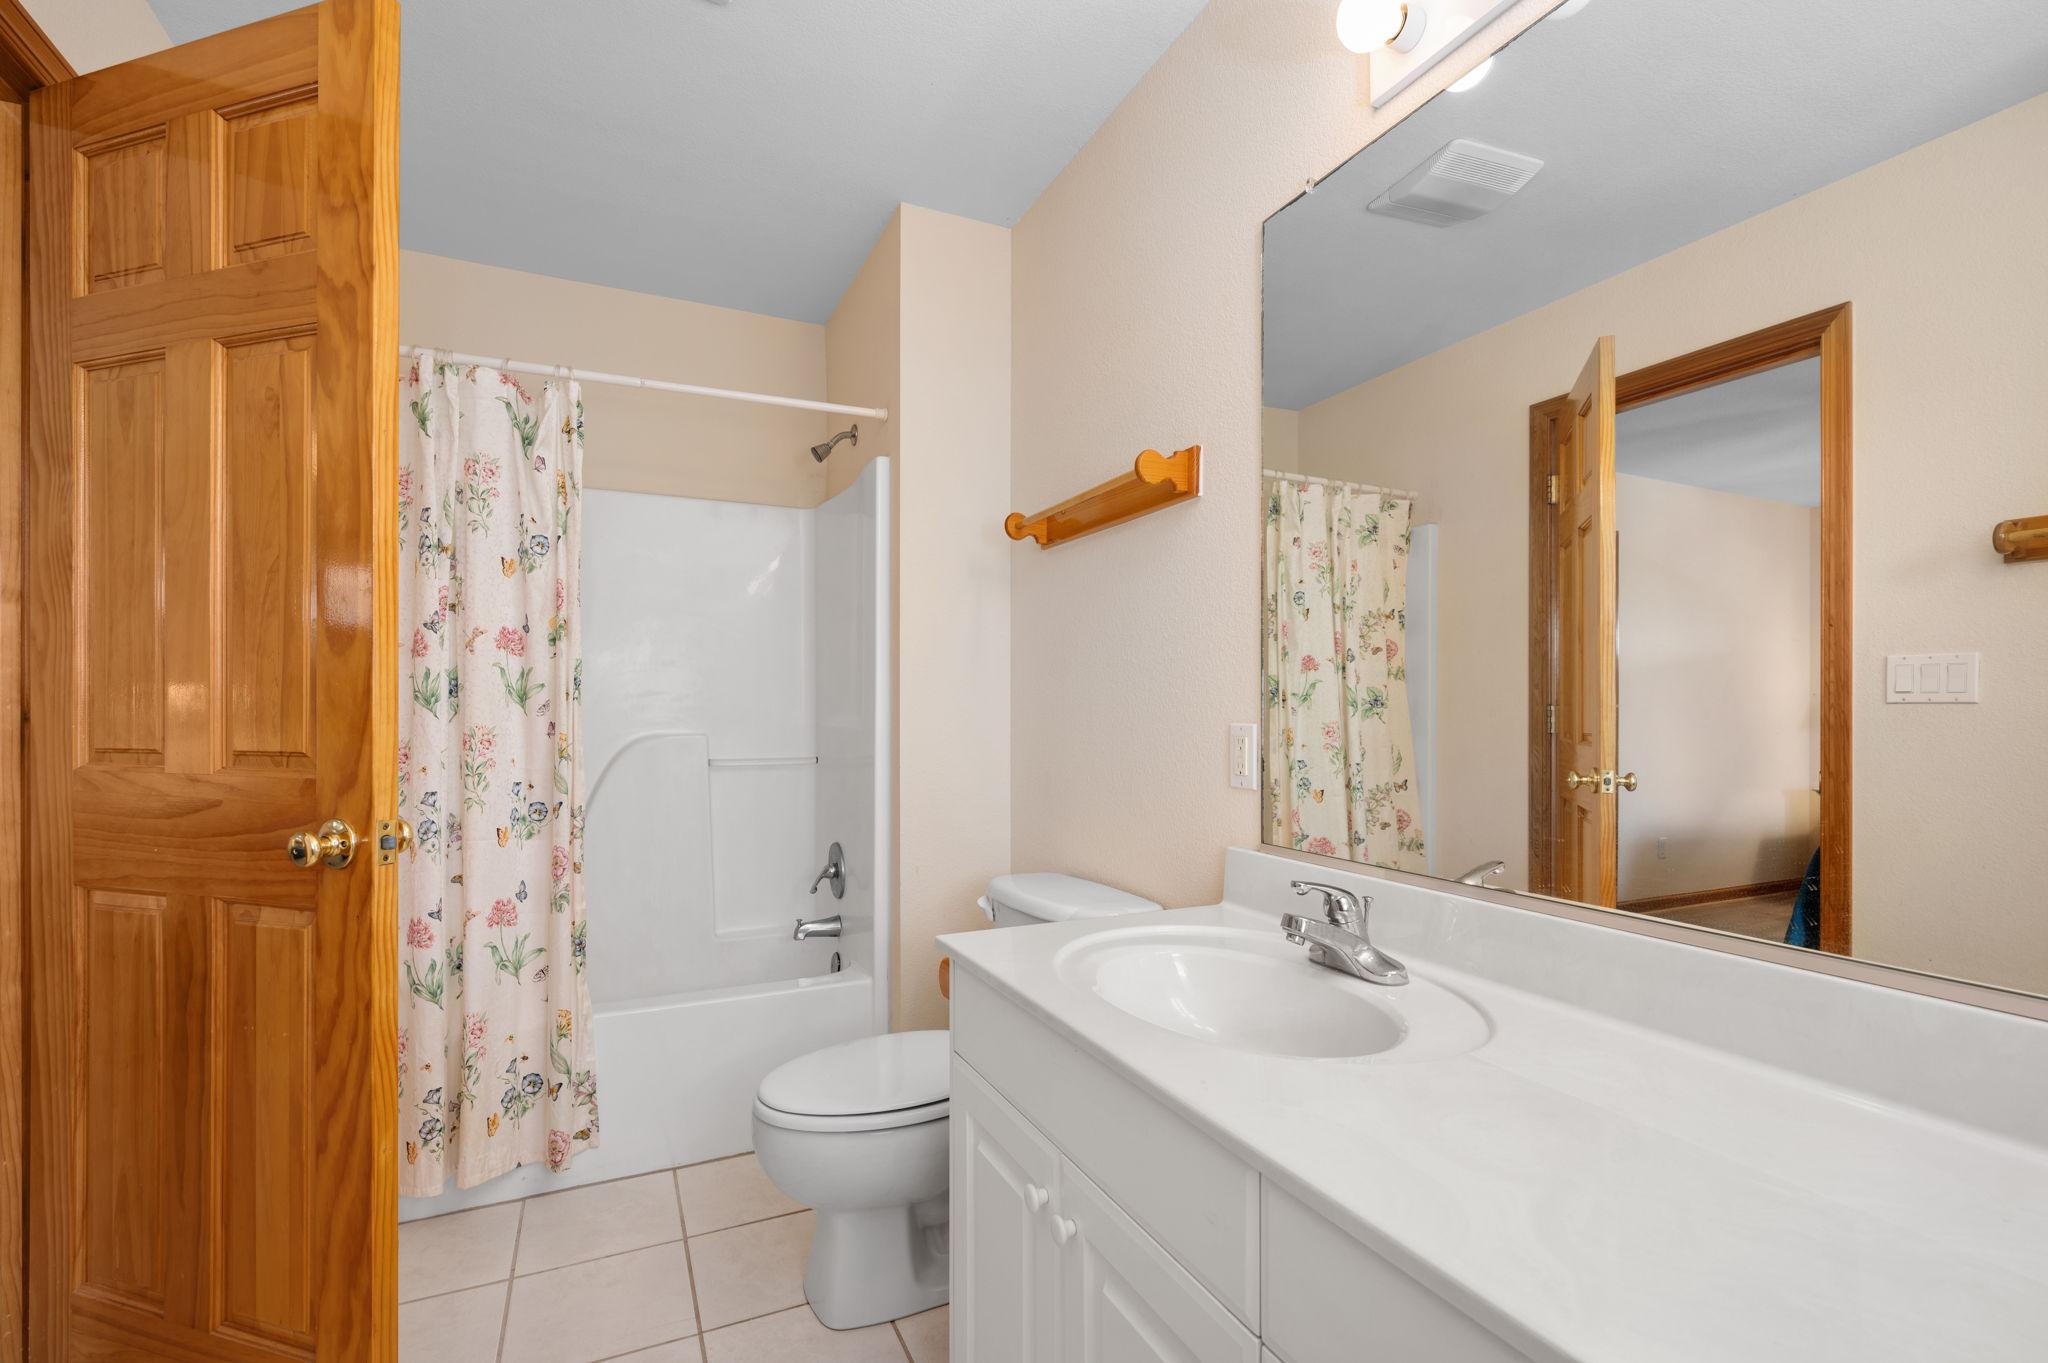 795 Mercury Road   Mid Level Bedroom 4 - Private Bath